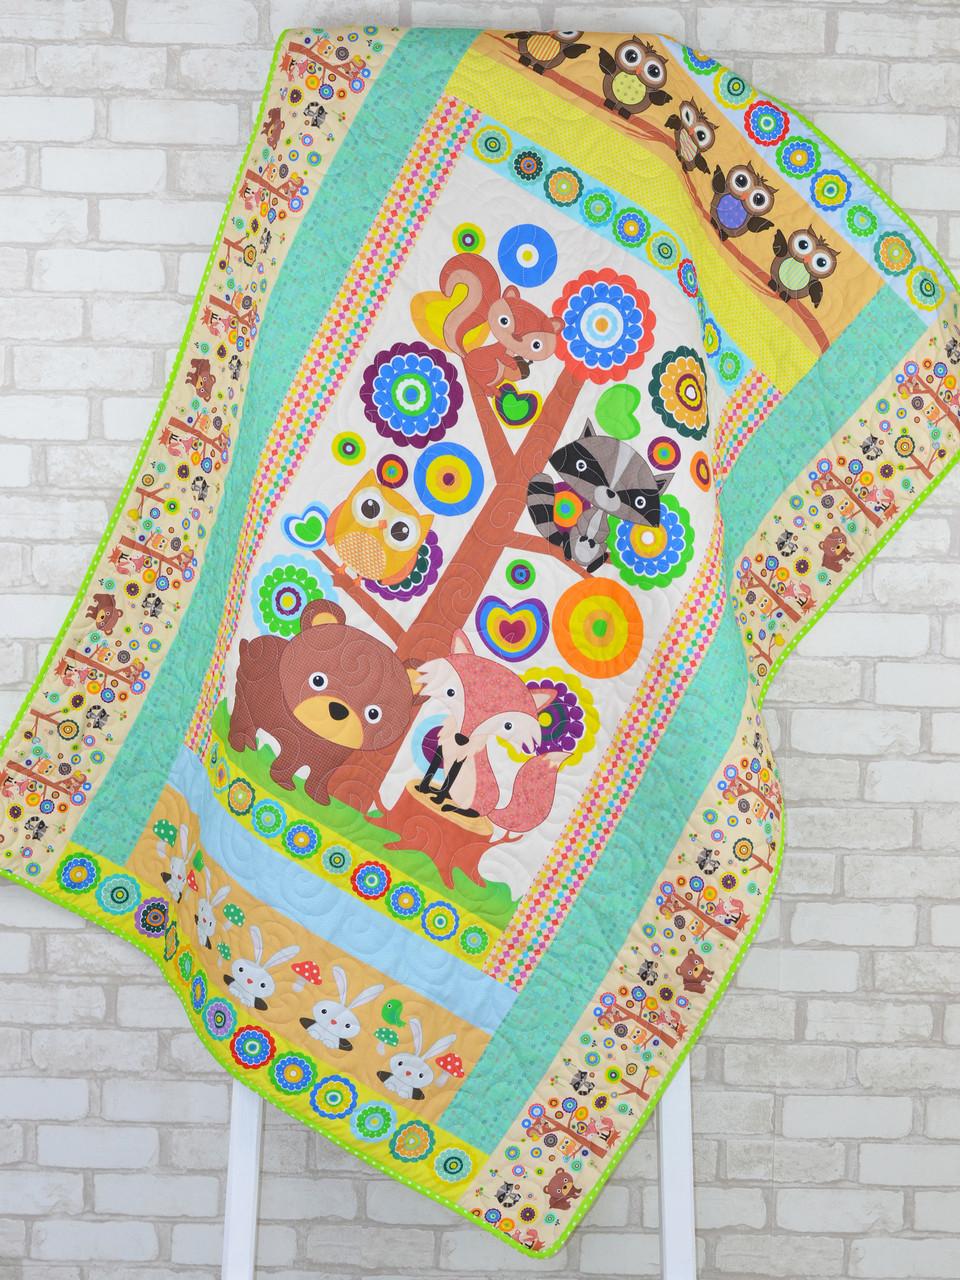 Детское одеяло-покрывало «Лесное дерево», Loskutini